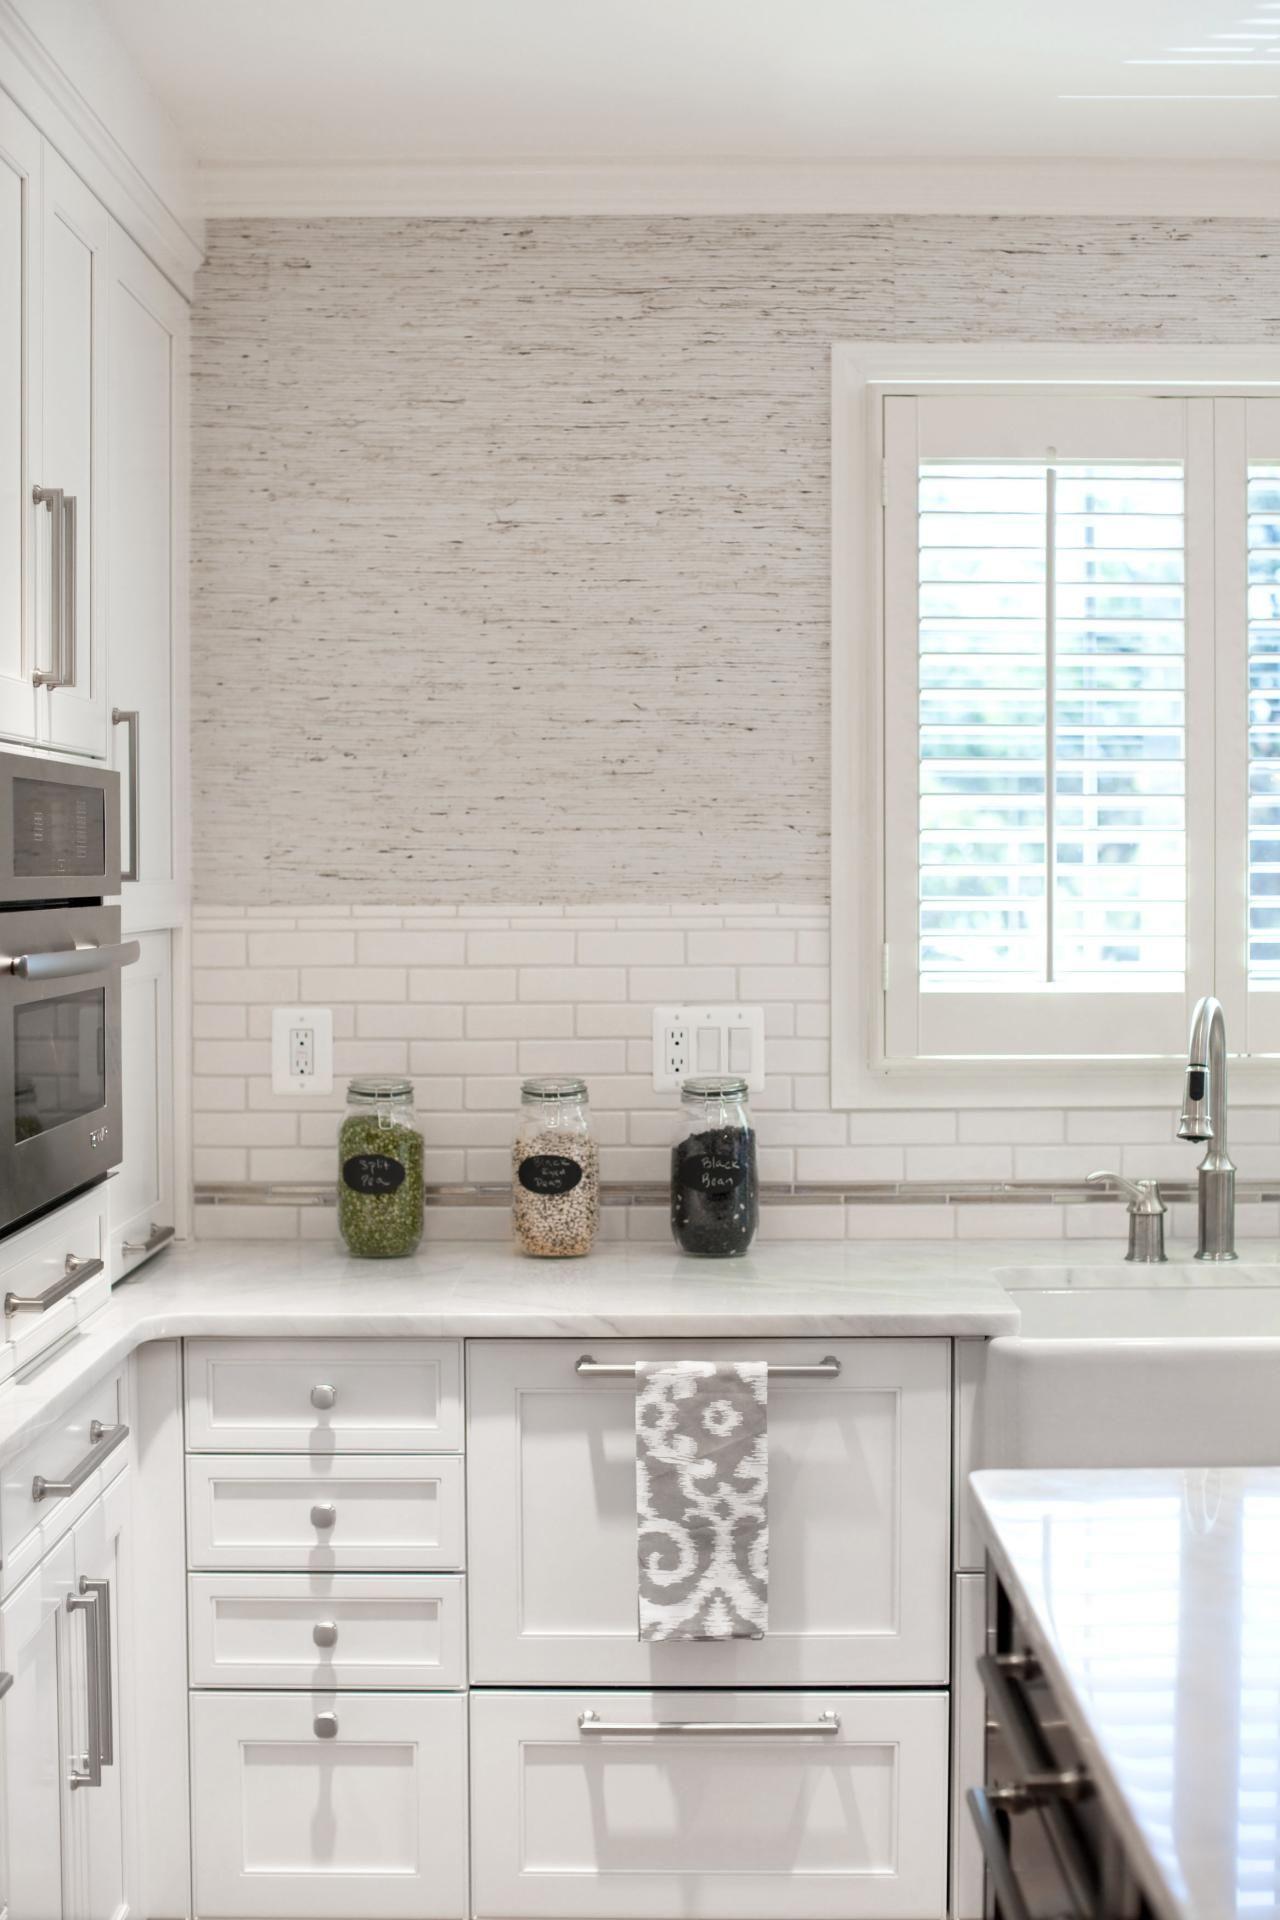 9+] Best Wallpaper for Kitchen on WallpaperSafari